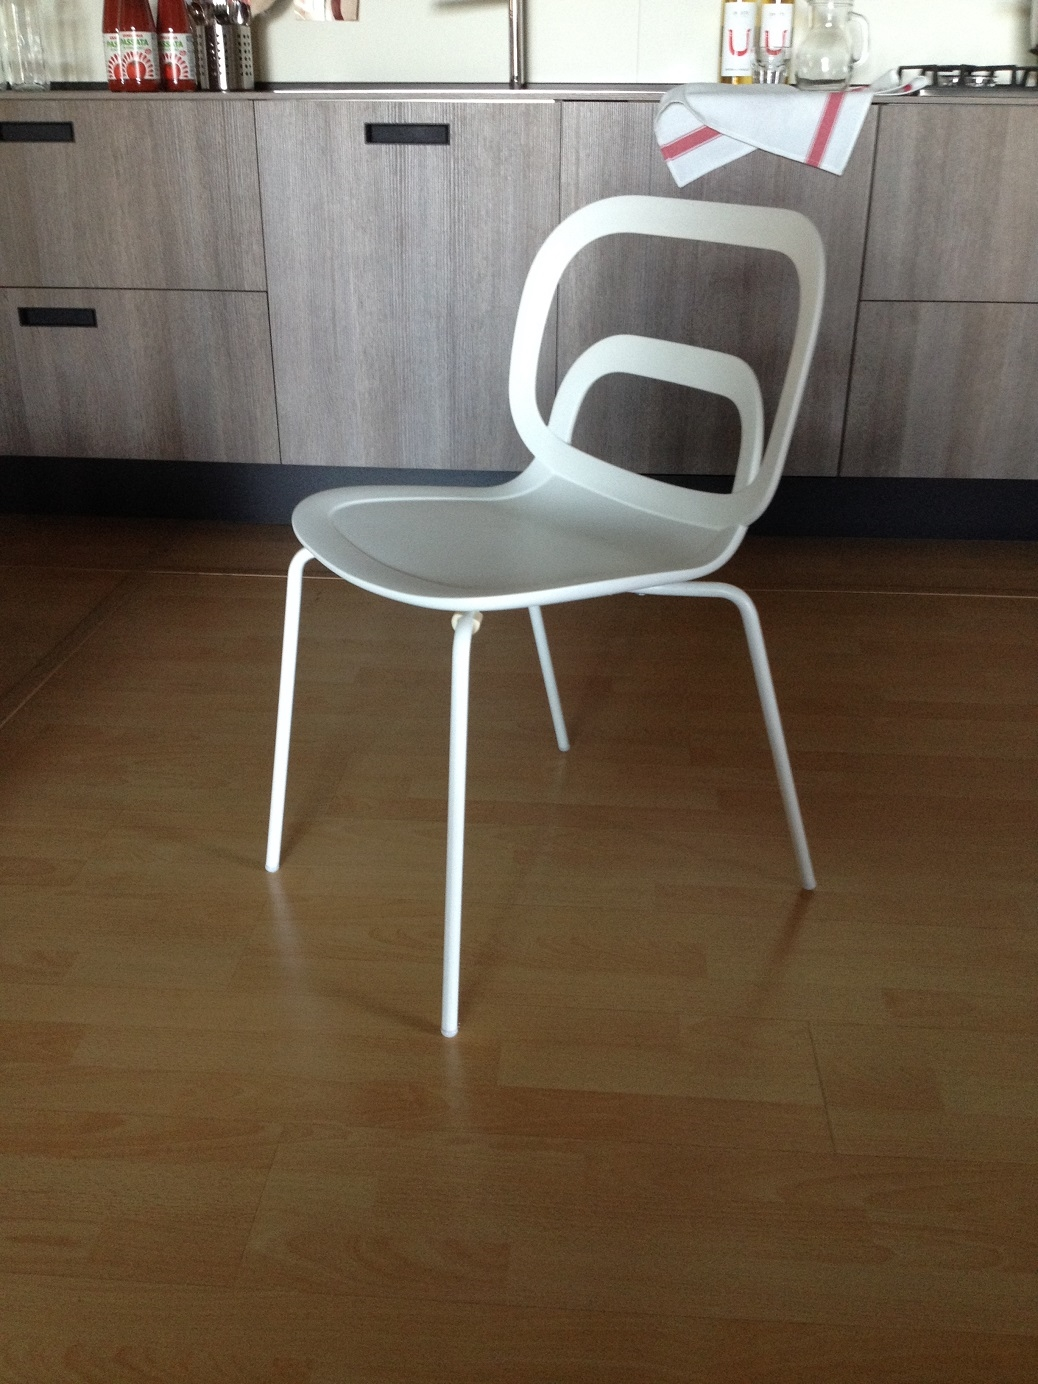 Sedie bianche moderne ciacci scontate del 50 sedie a for Sedie scontate